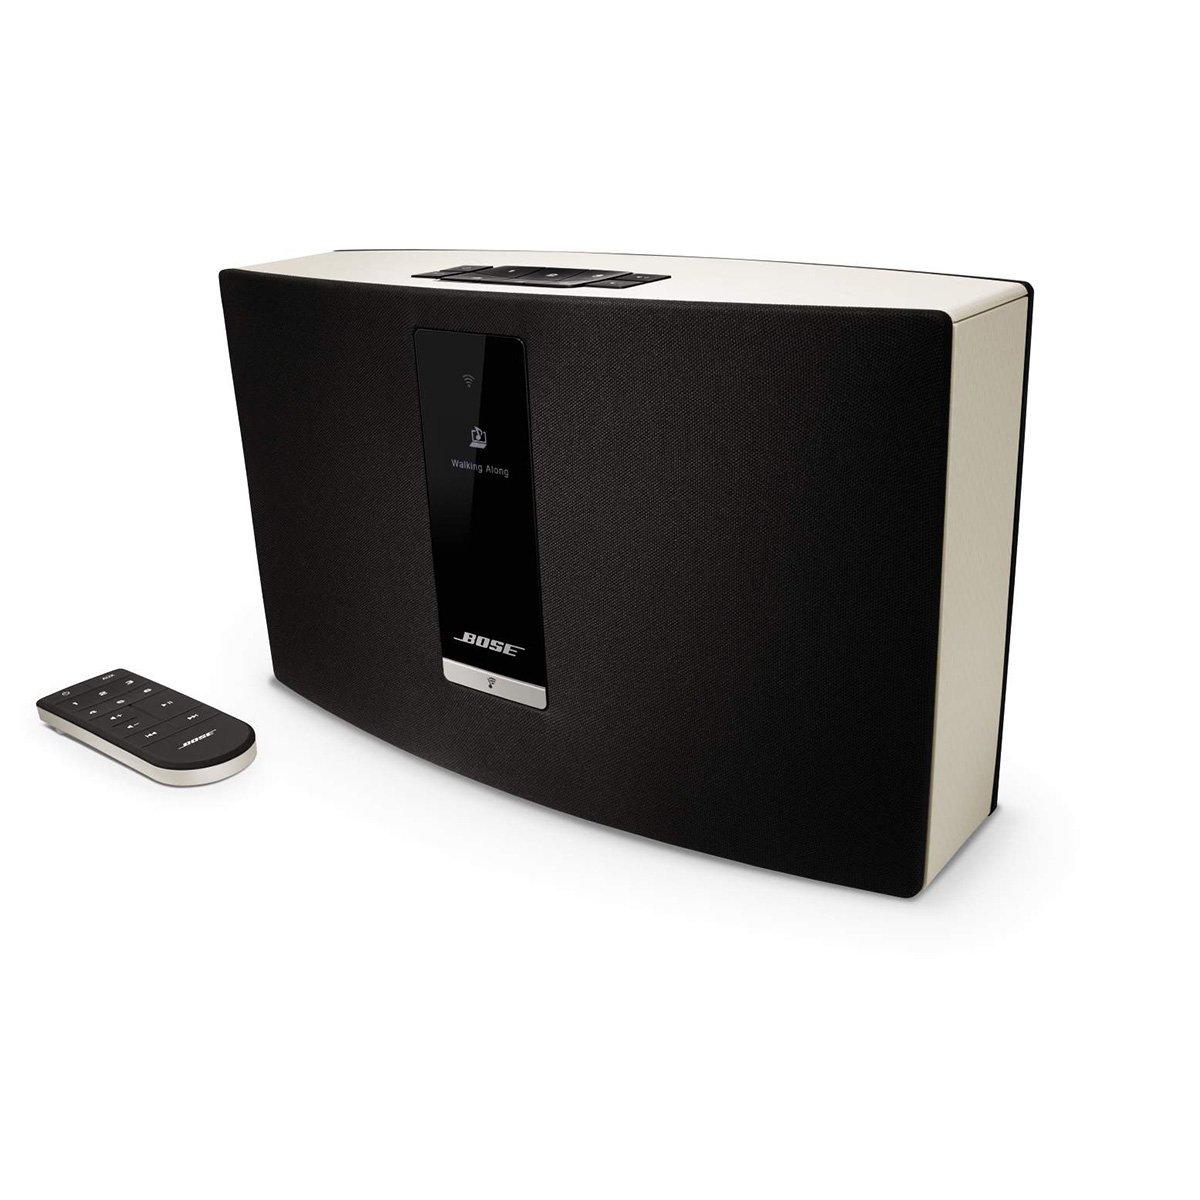 kabellos und unkompliziert bose soundtouch 20 hifi agent. Black Bedroom Furniture Sets. Home Design Ideas